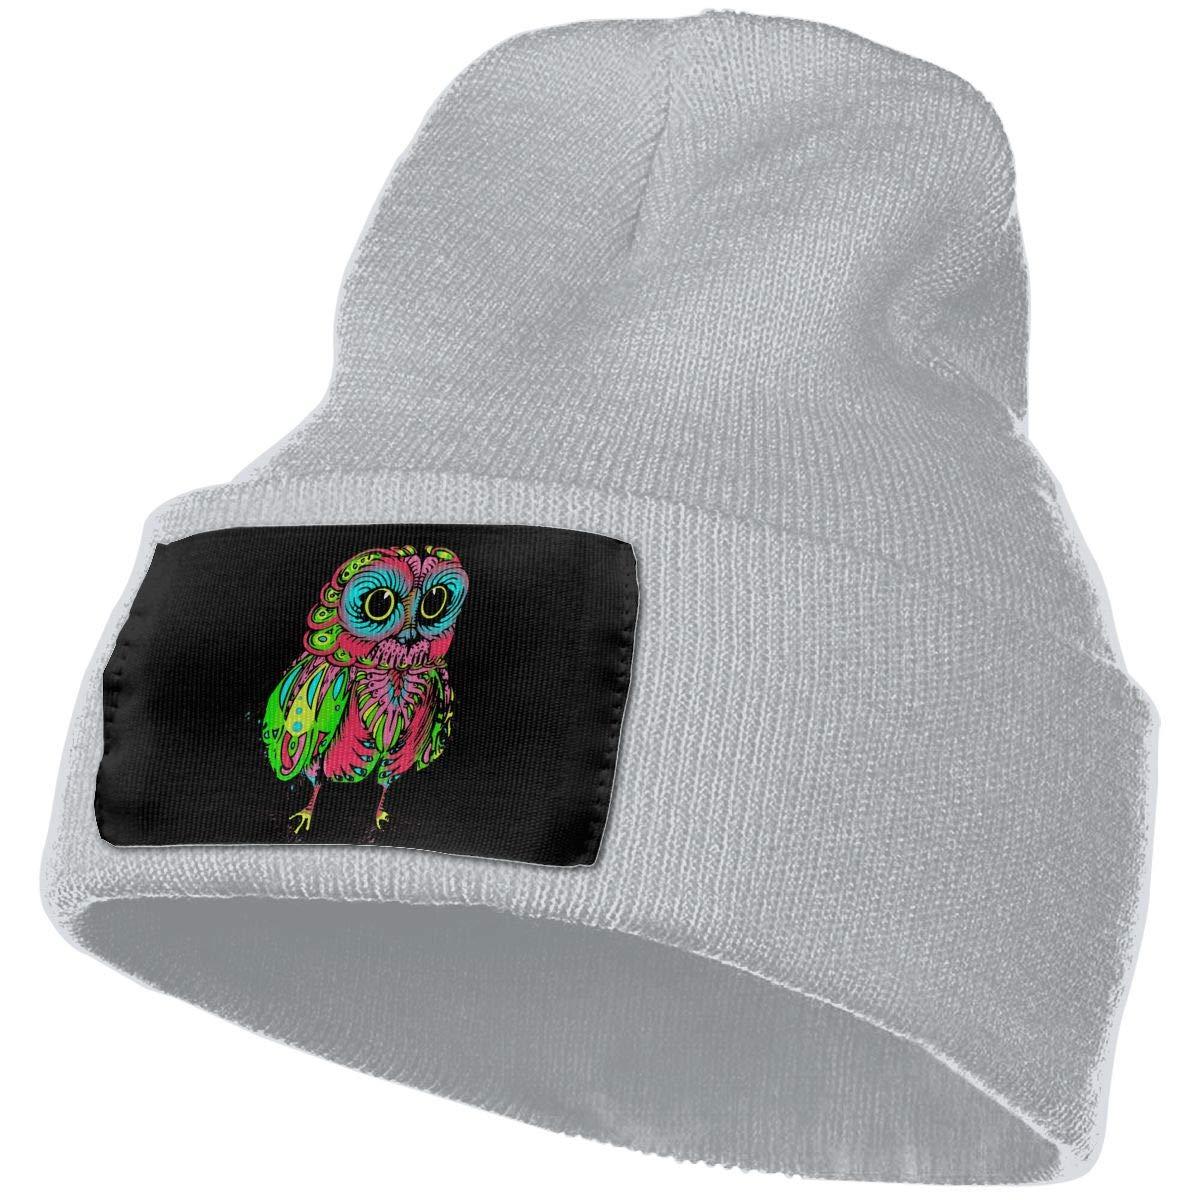 Unisex 100/% Acrylic Knit Hat Cap Psychedelic Owl Original Beanie Hat